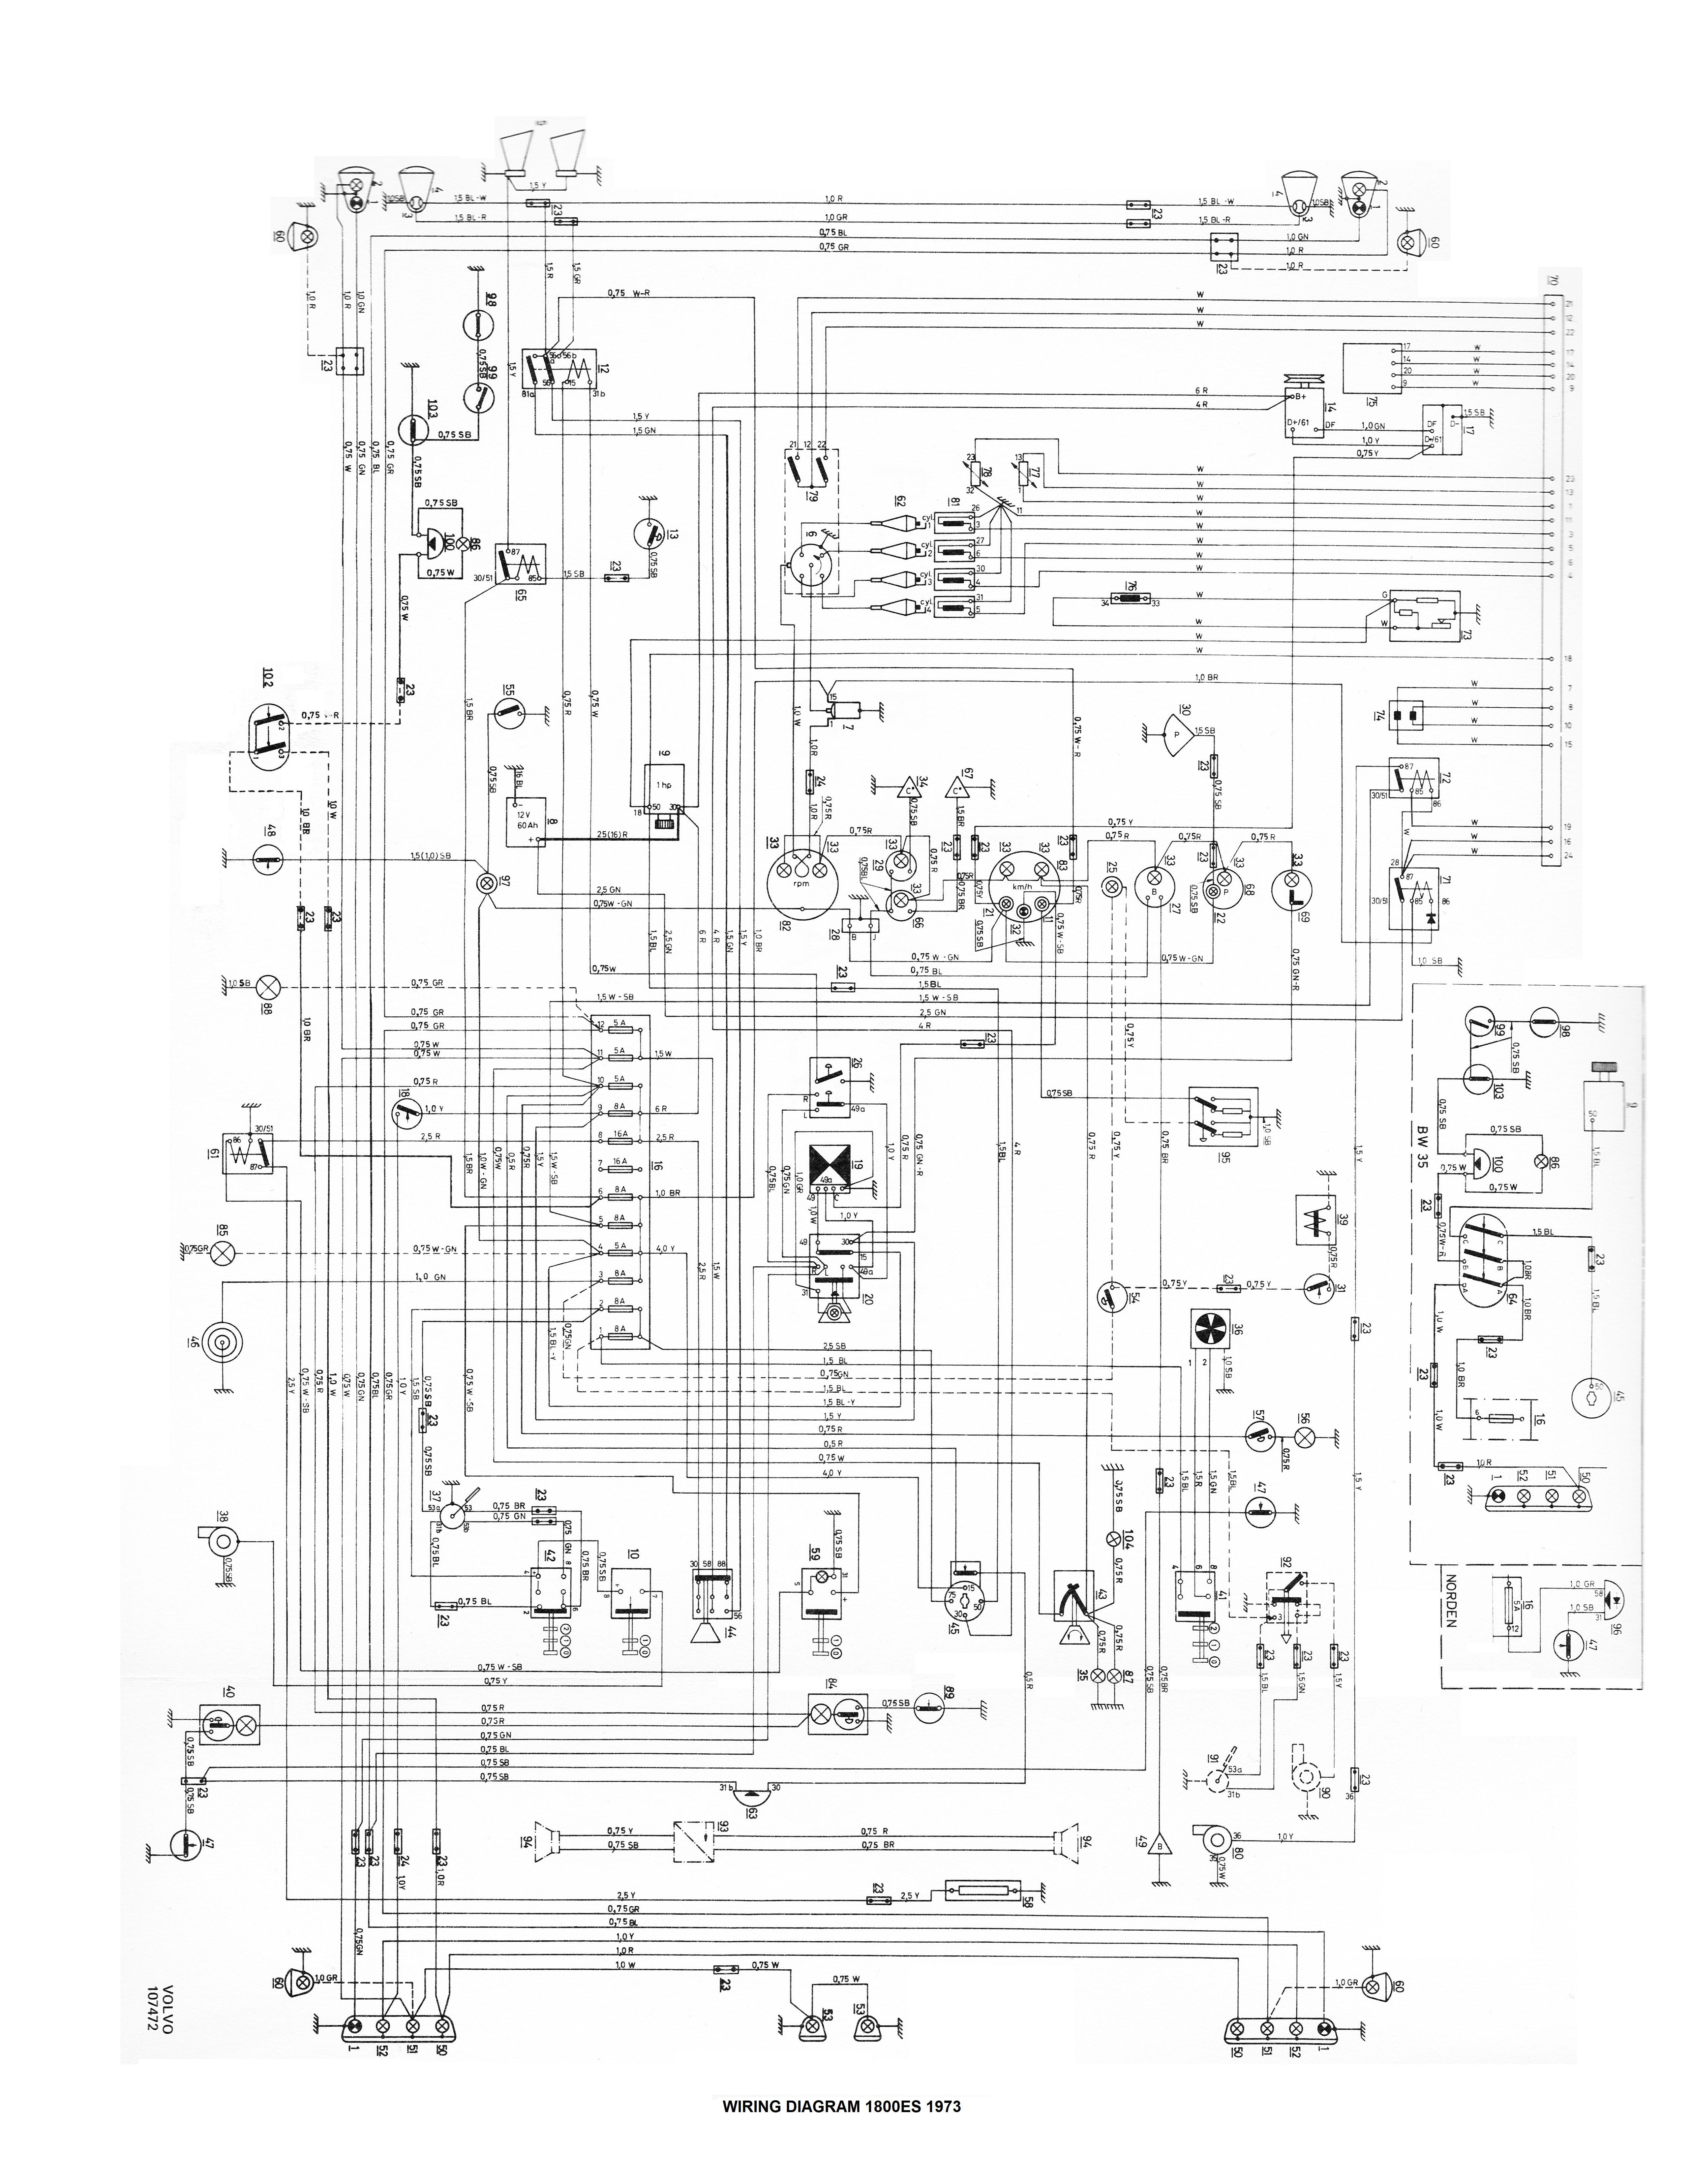 2007 peterbilt 379 wiring diagram yl 6960  m2 wiring diagrams on 387 peterbilt headlight wiring  m2 wiring diagrams on 387 peterbilt